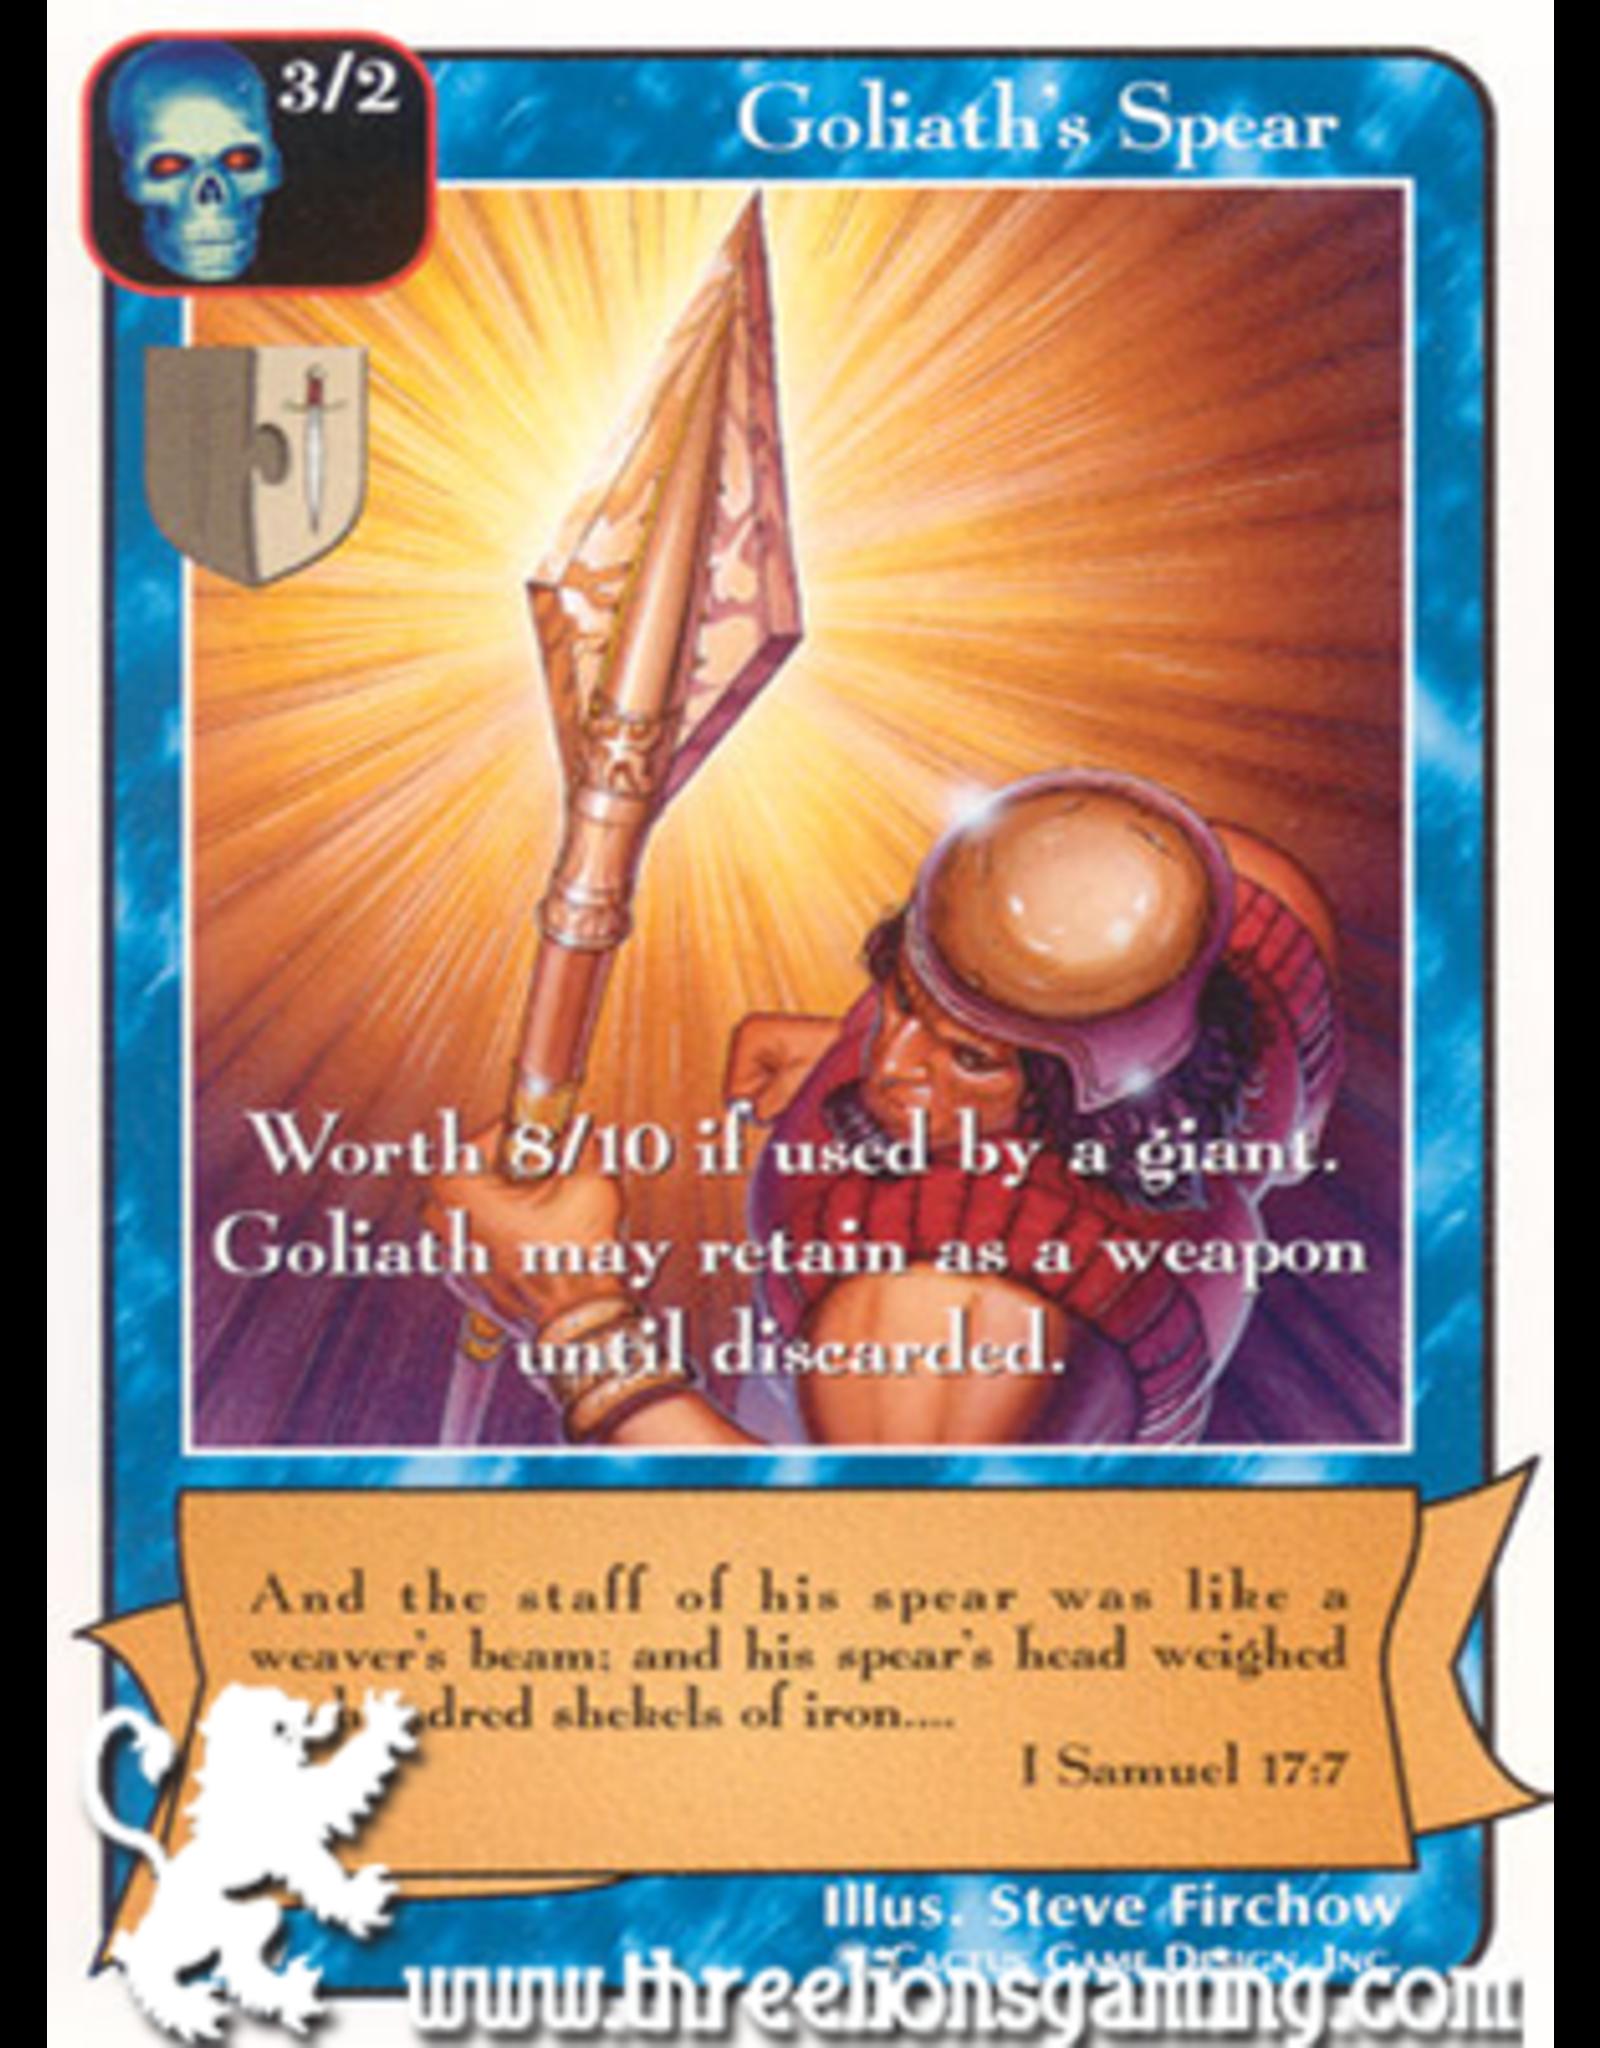 Ki: Goliath's Spear